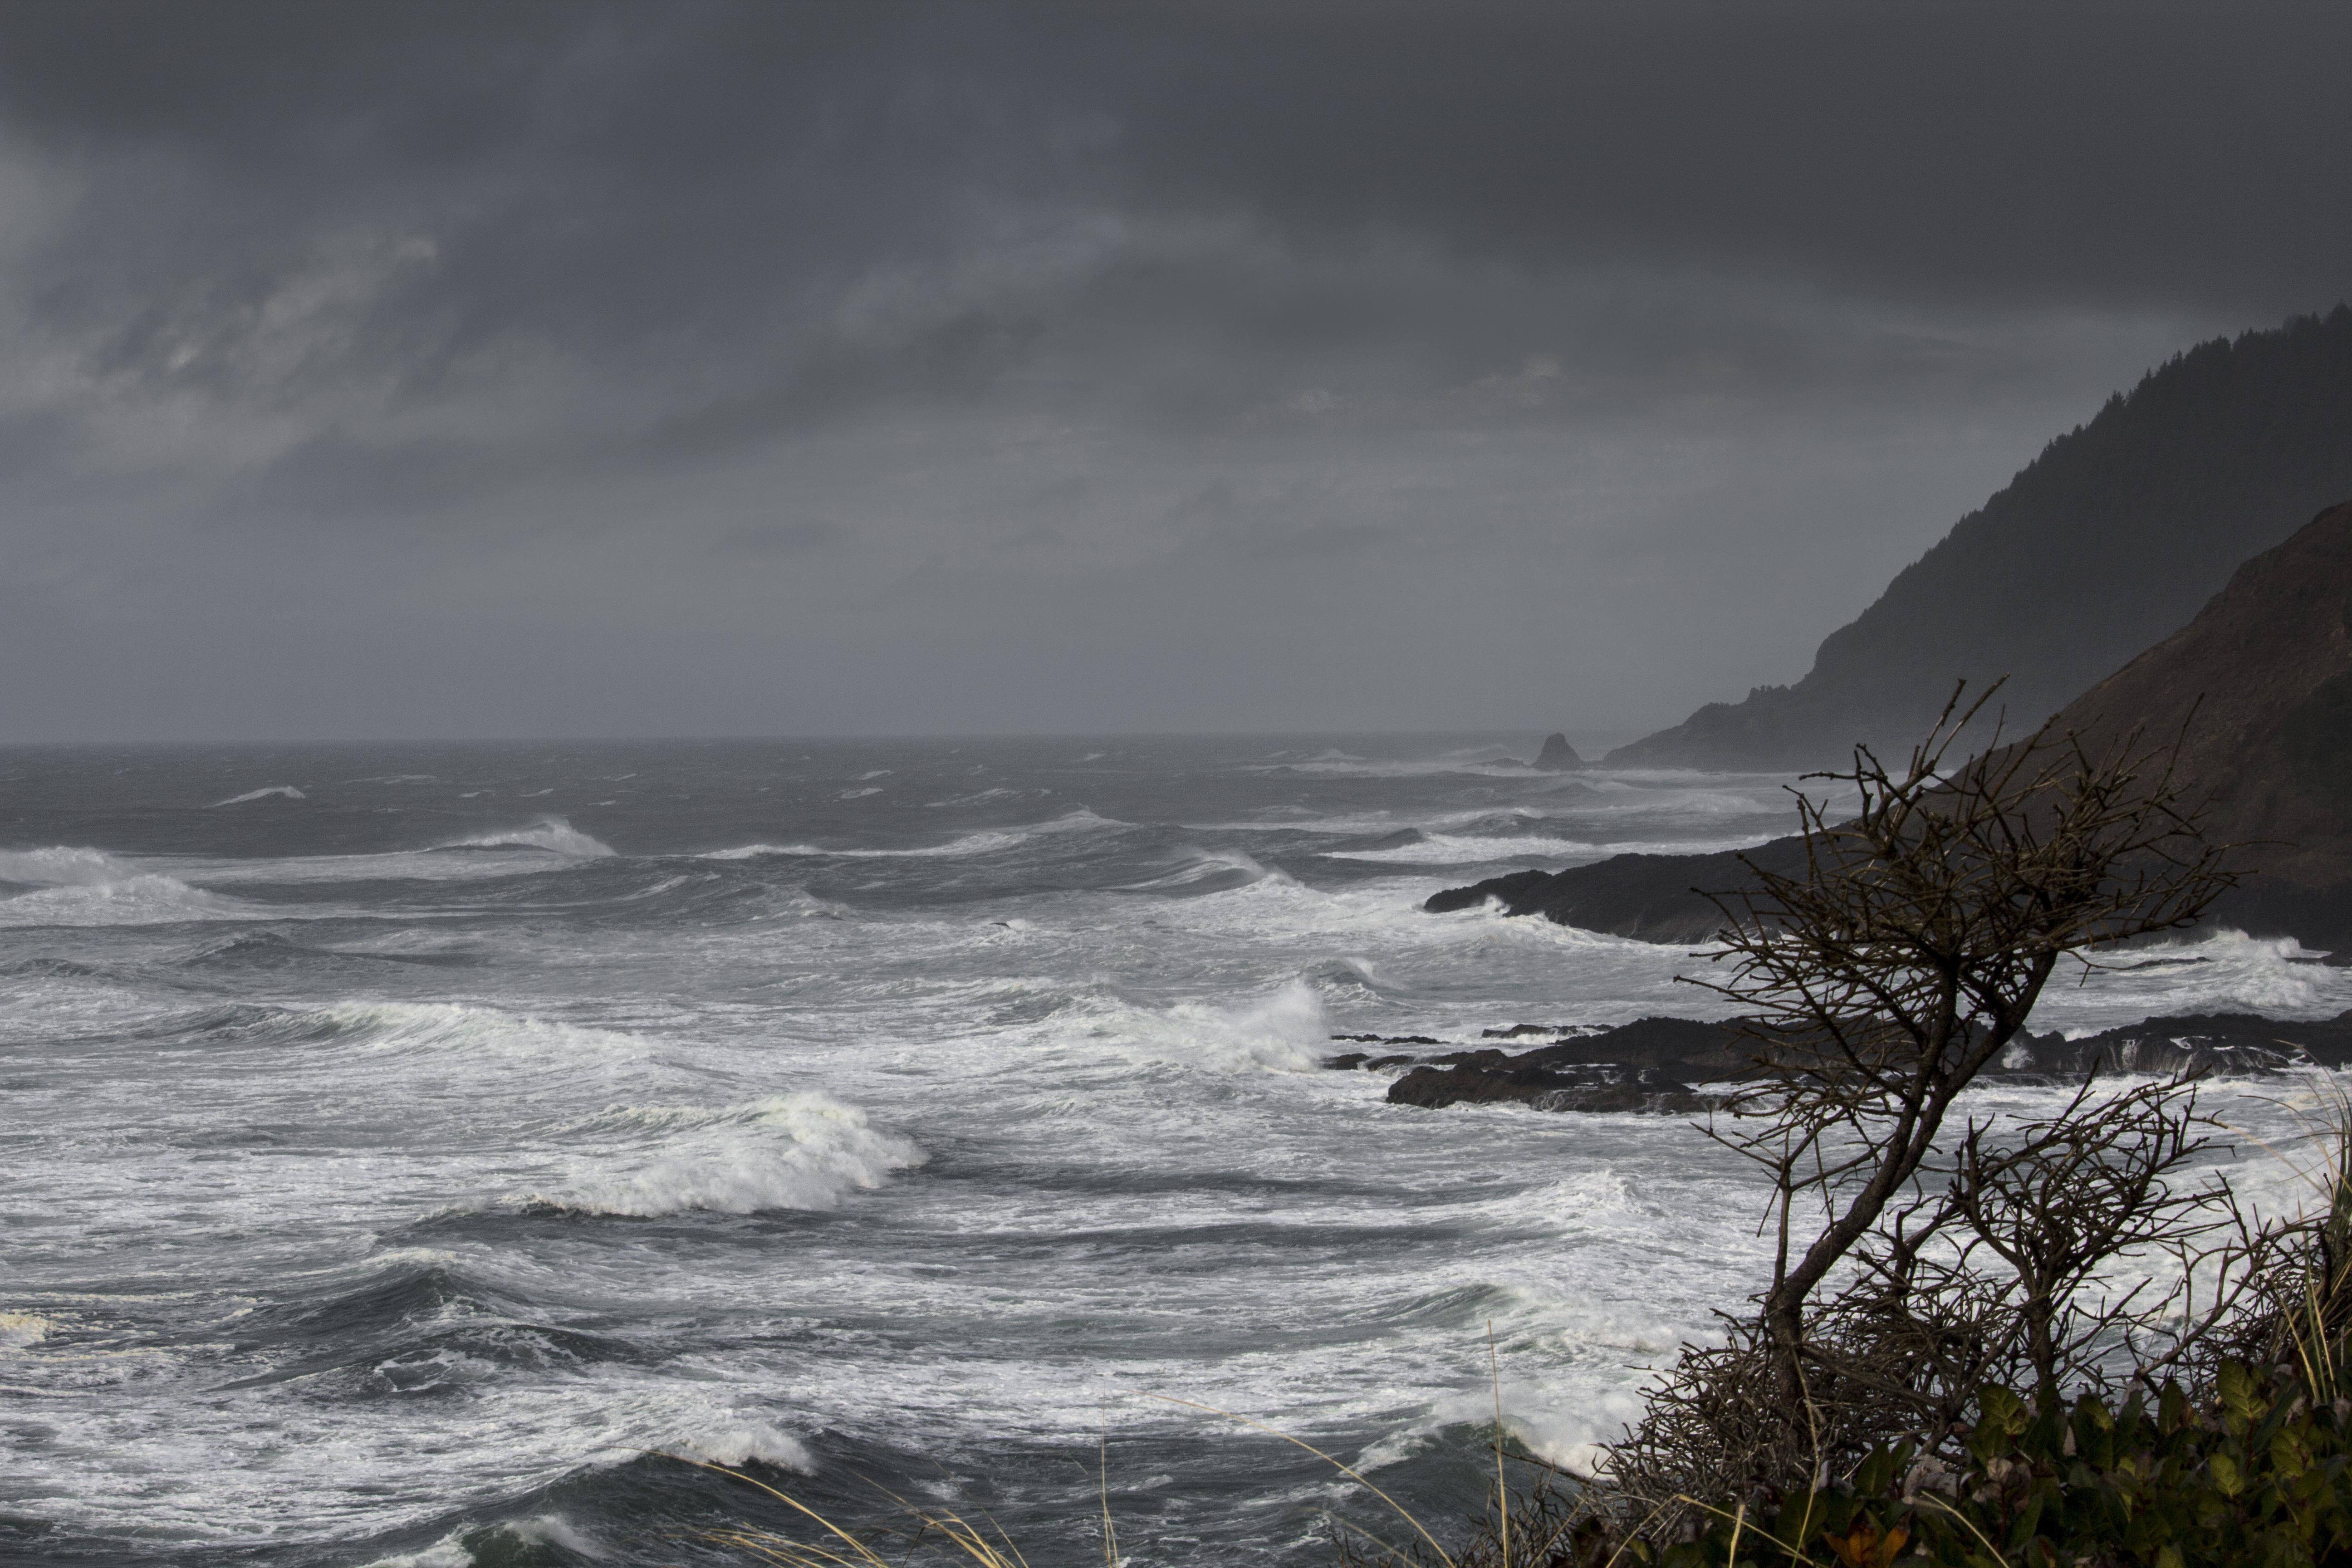 Winter storm , Oregon coast, Bay, Coast, Landscape, Mountain, HQ Photo